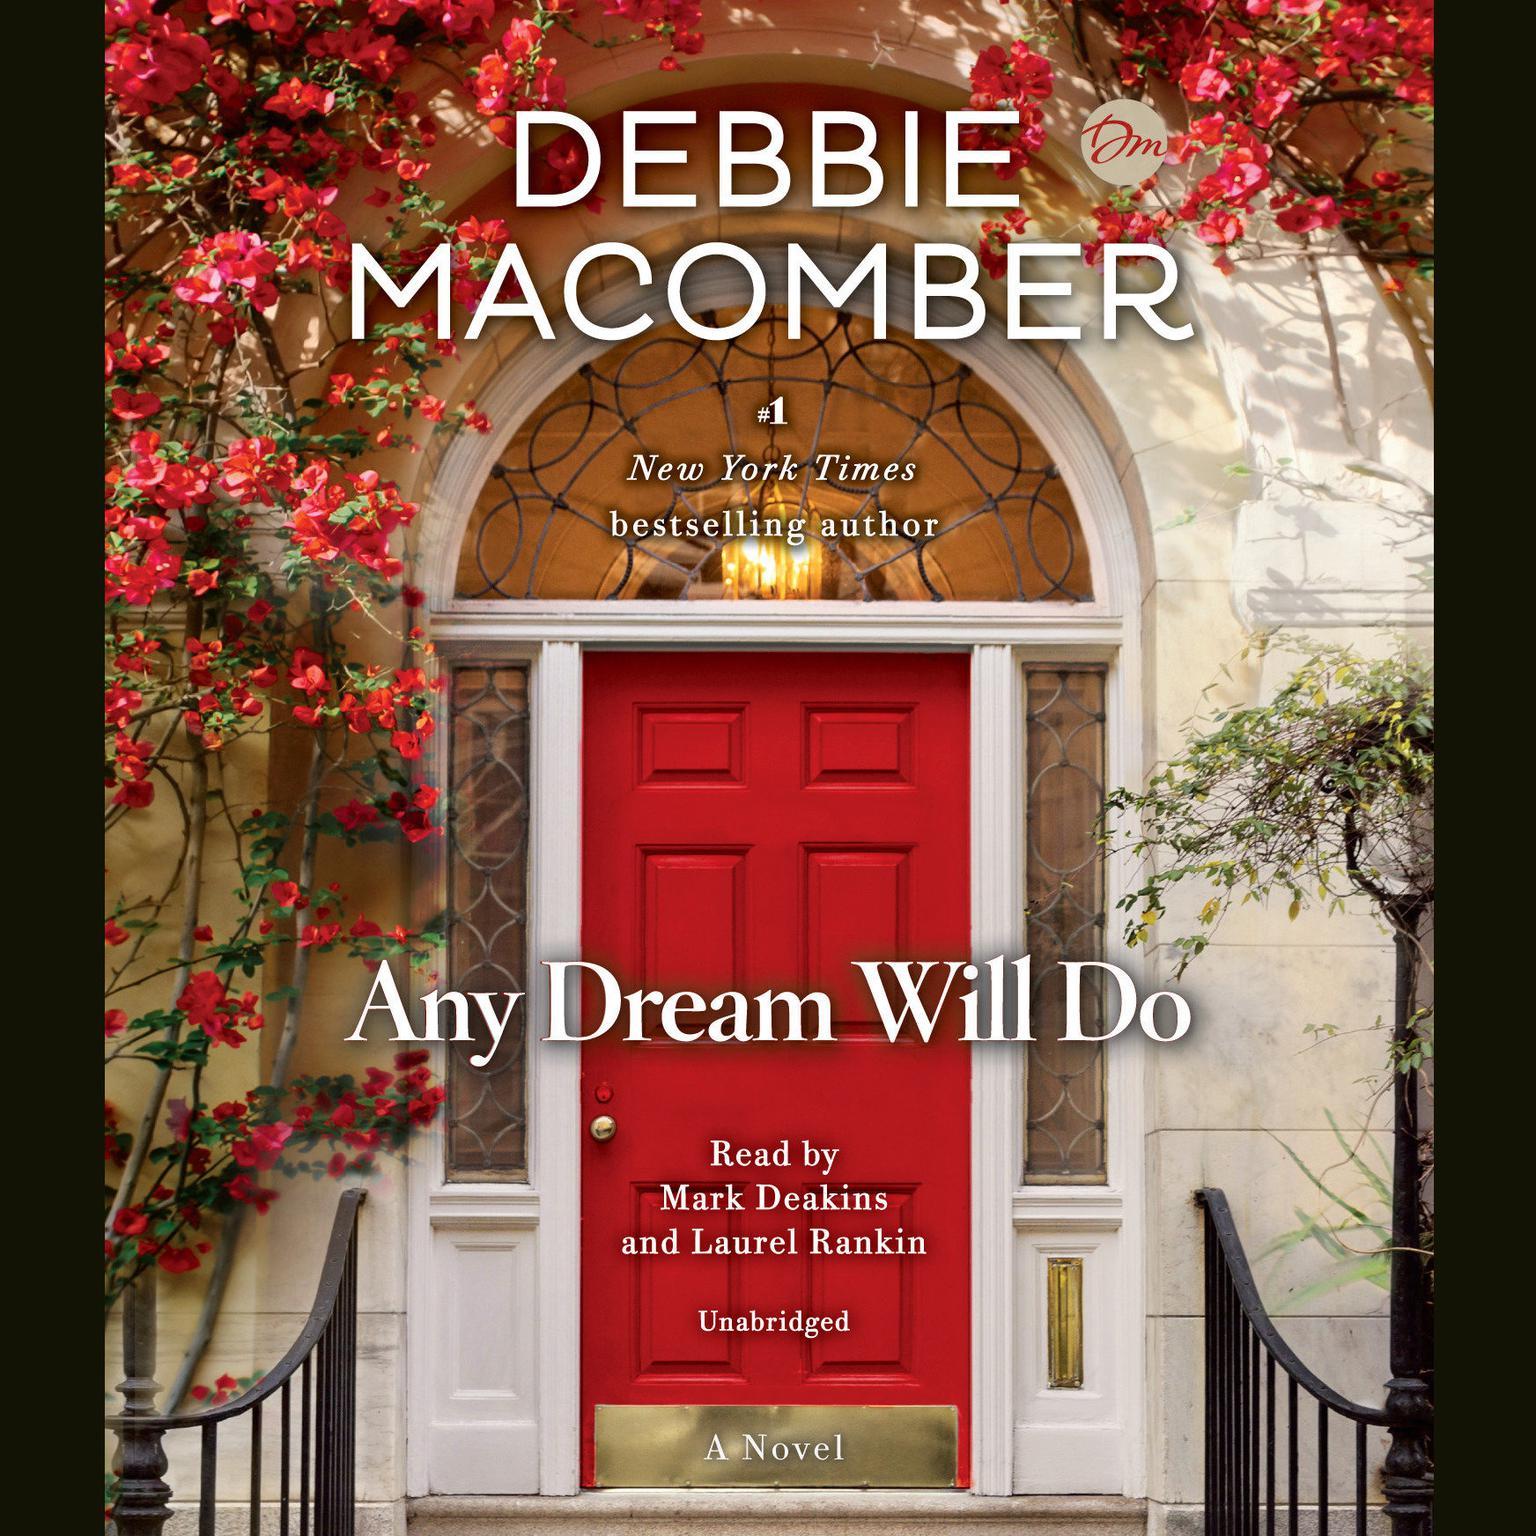 Any Dream Will Do: A Novel Audiobook, by Debbie Macomber